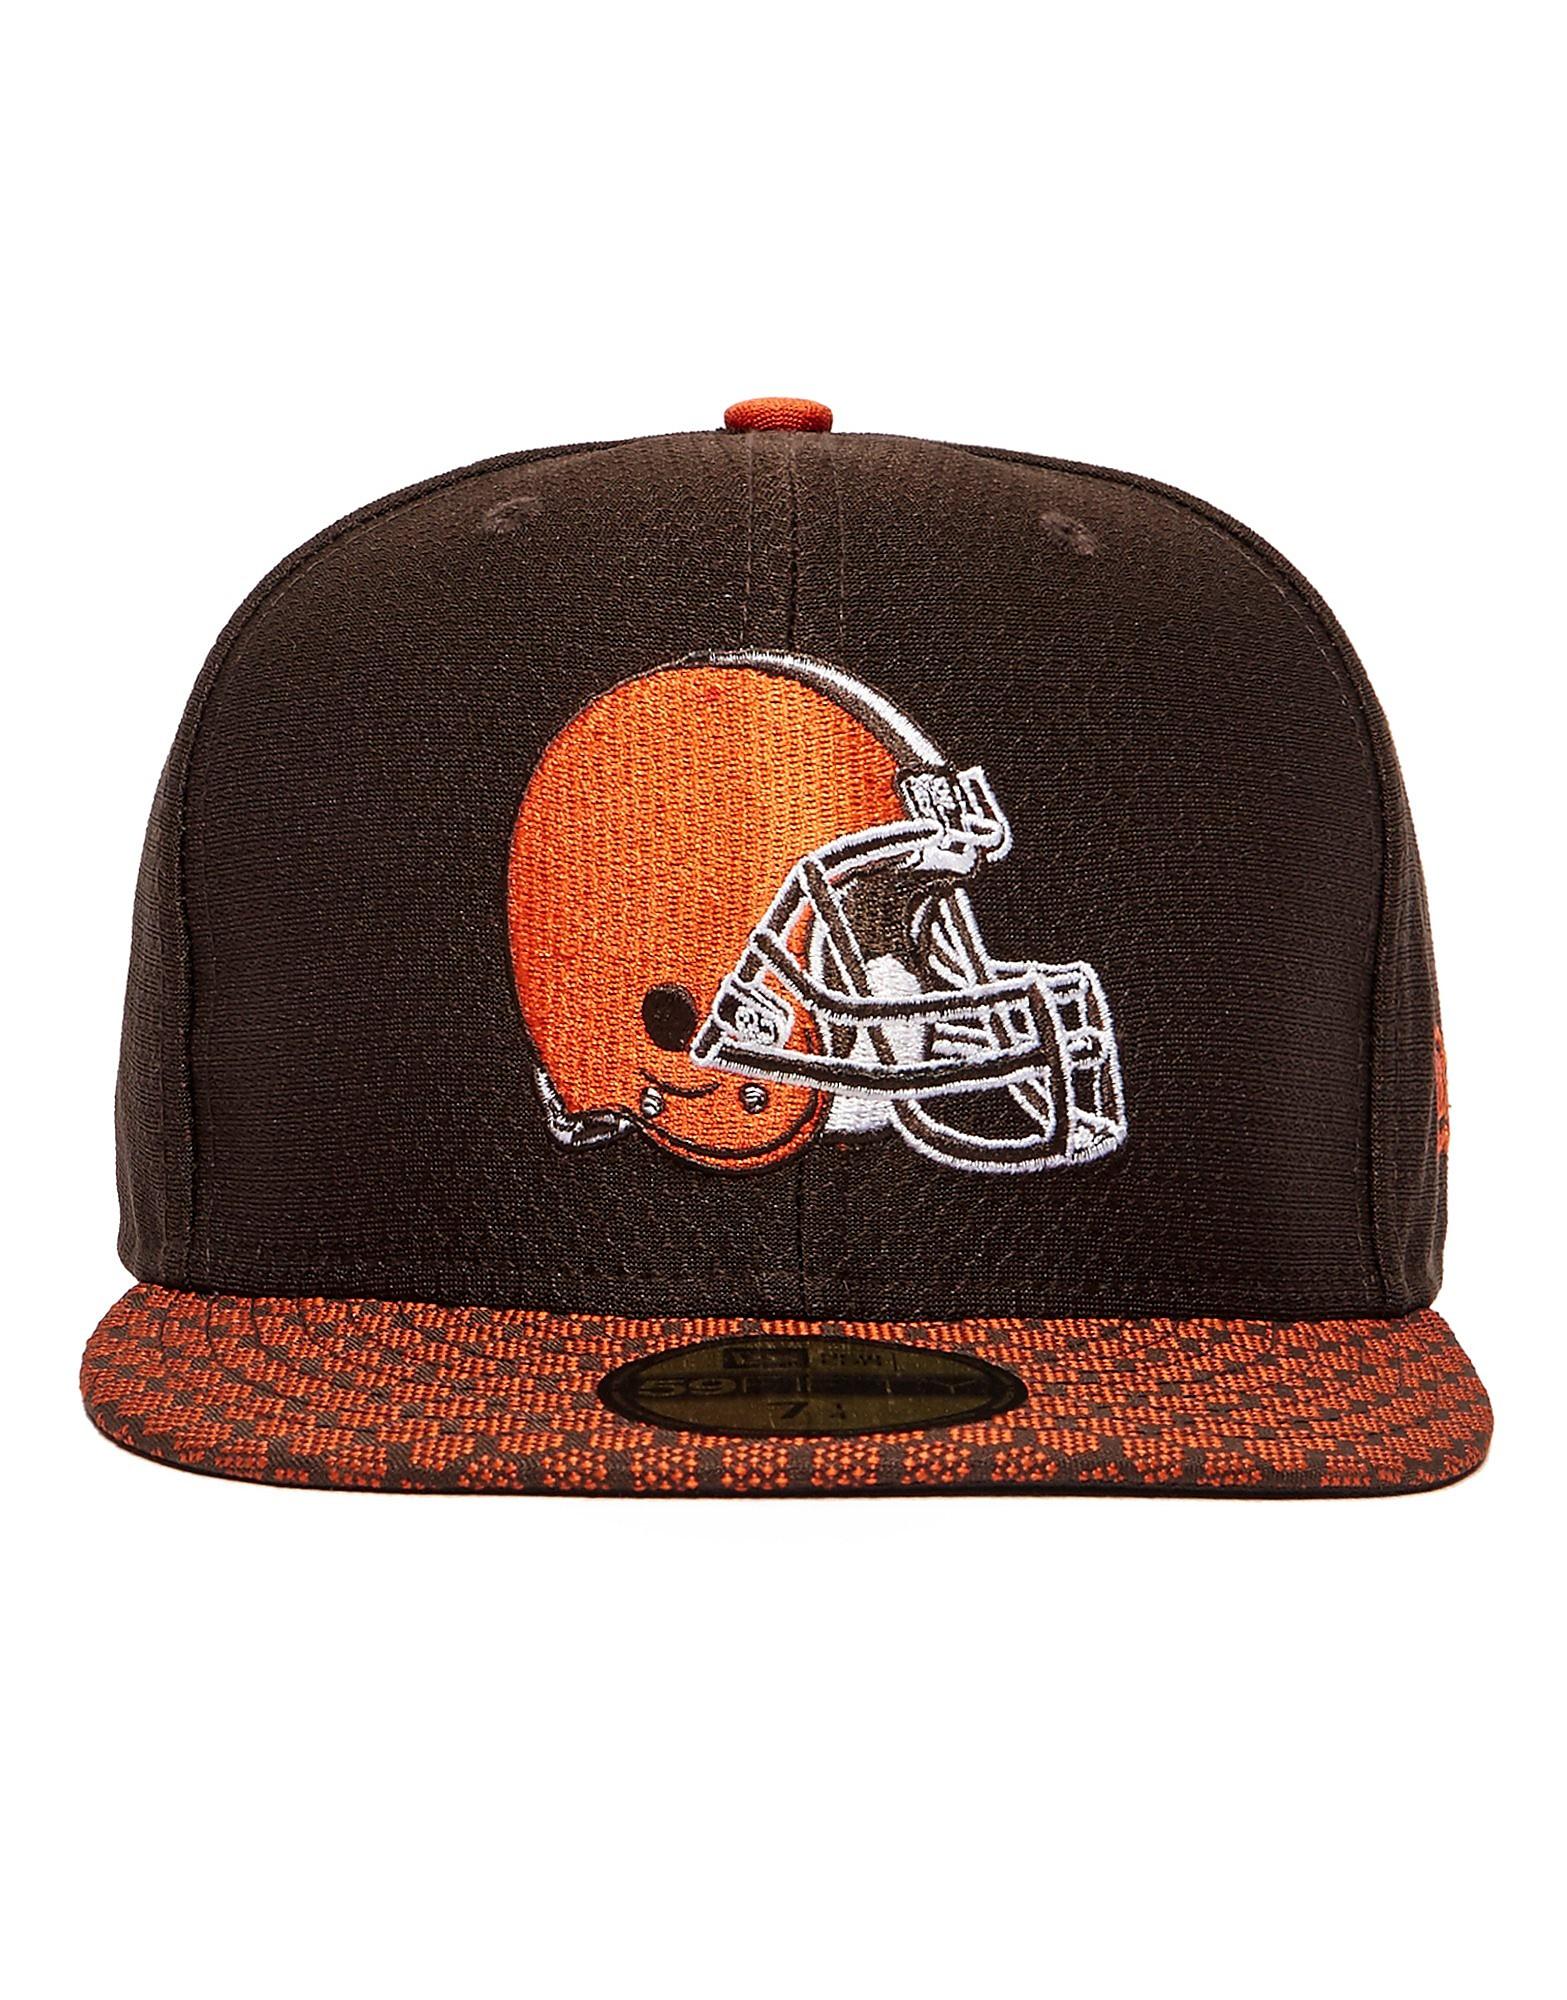 New Era Cleveland Browns 59FIFTY Cap